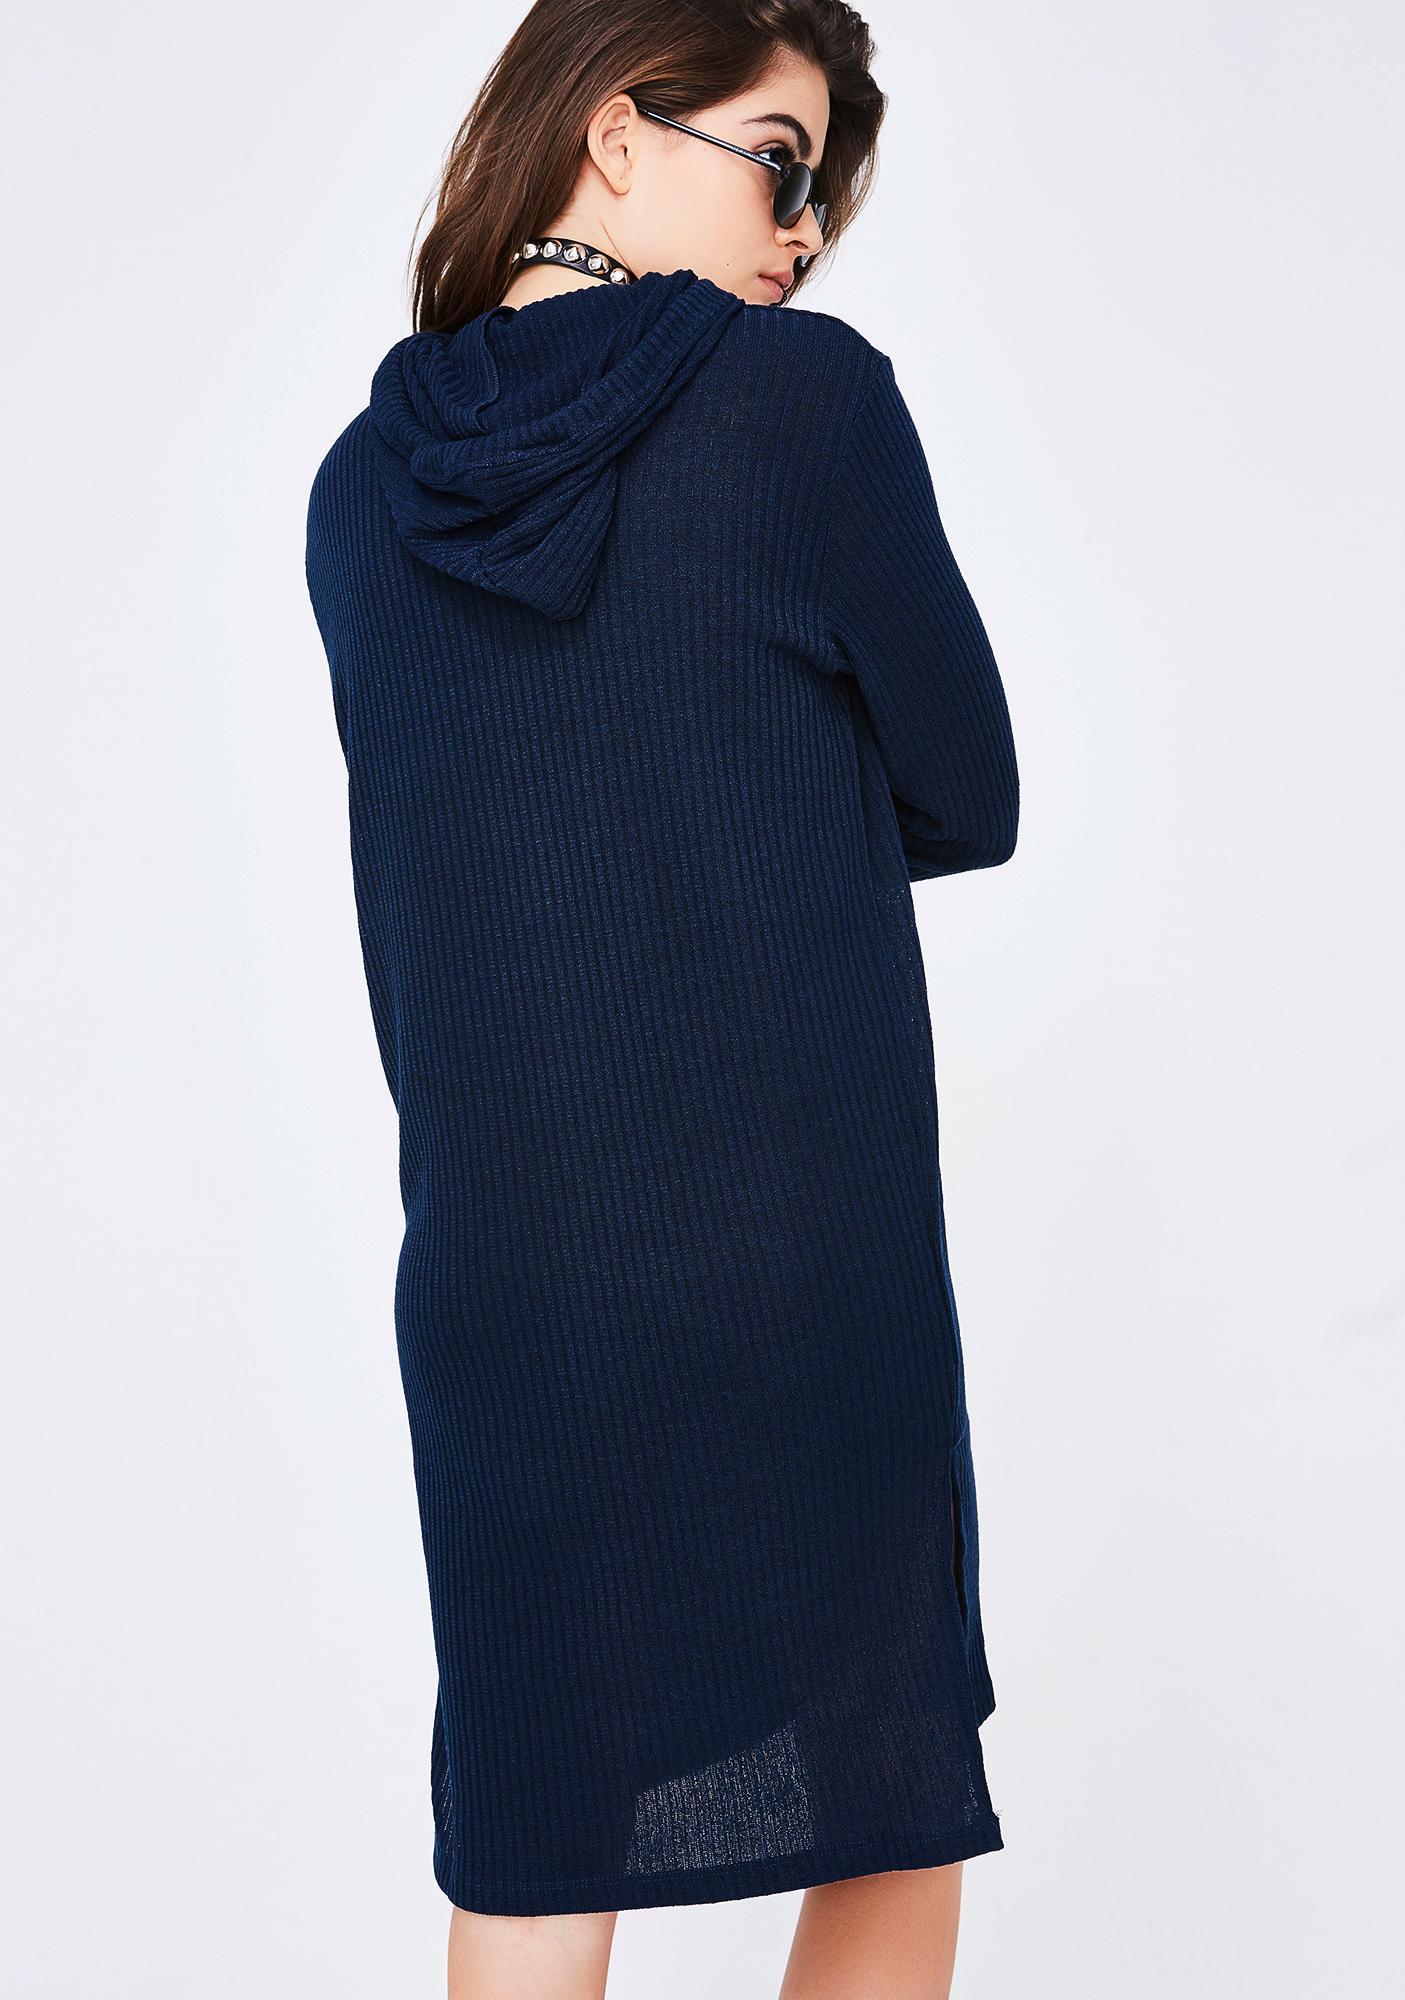 Why Try Hoodie Dress